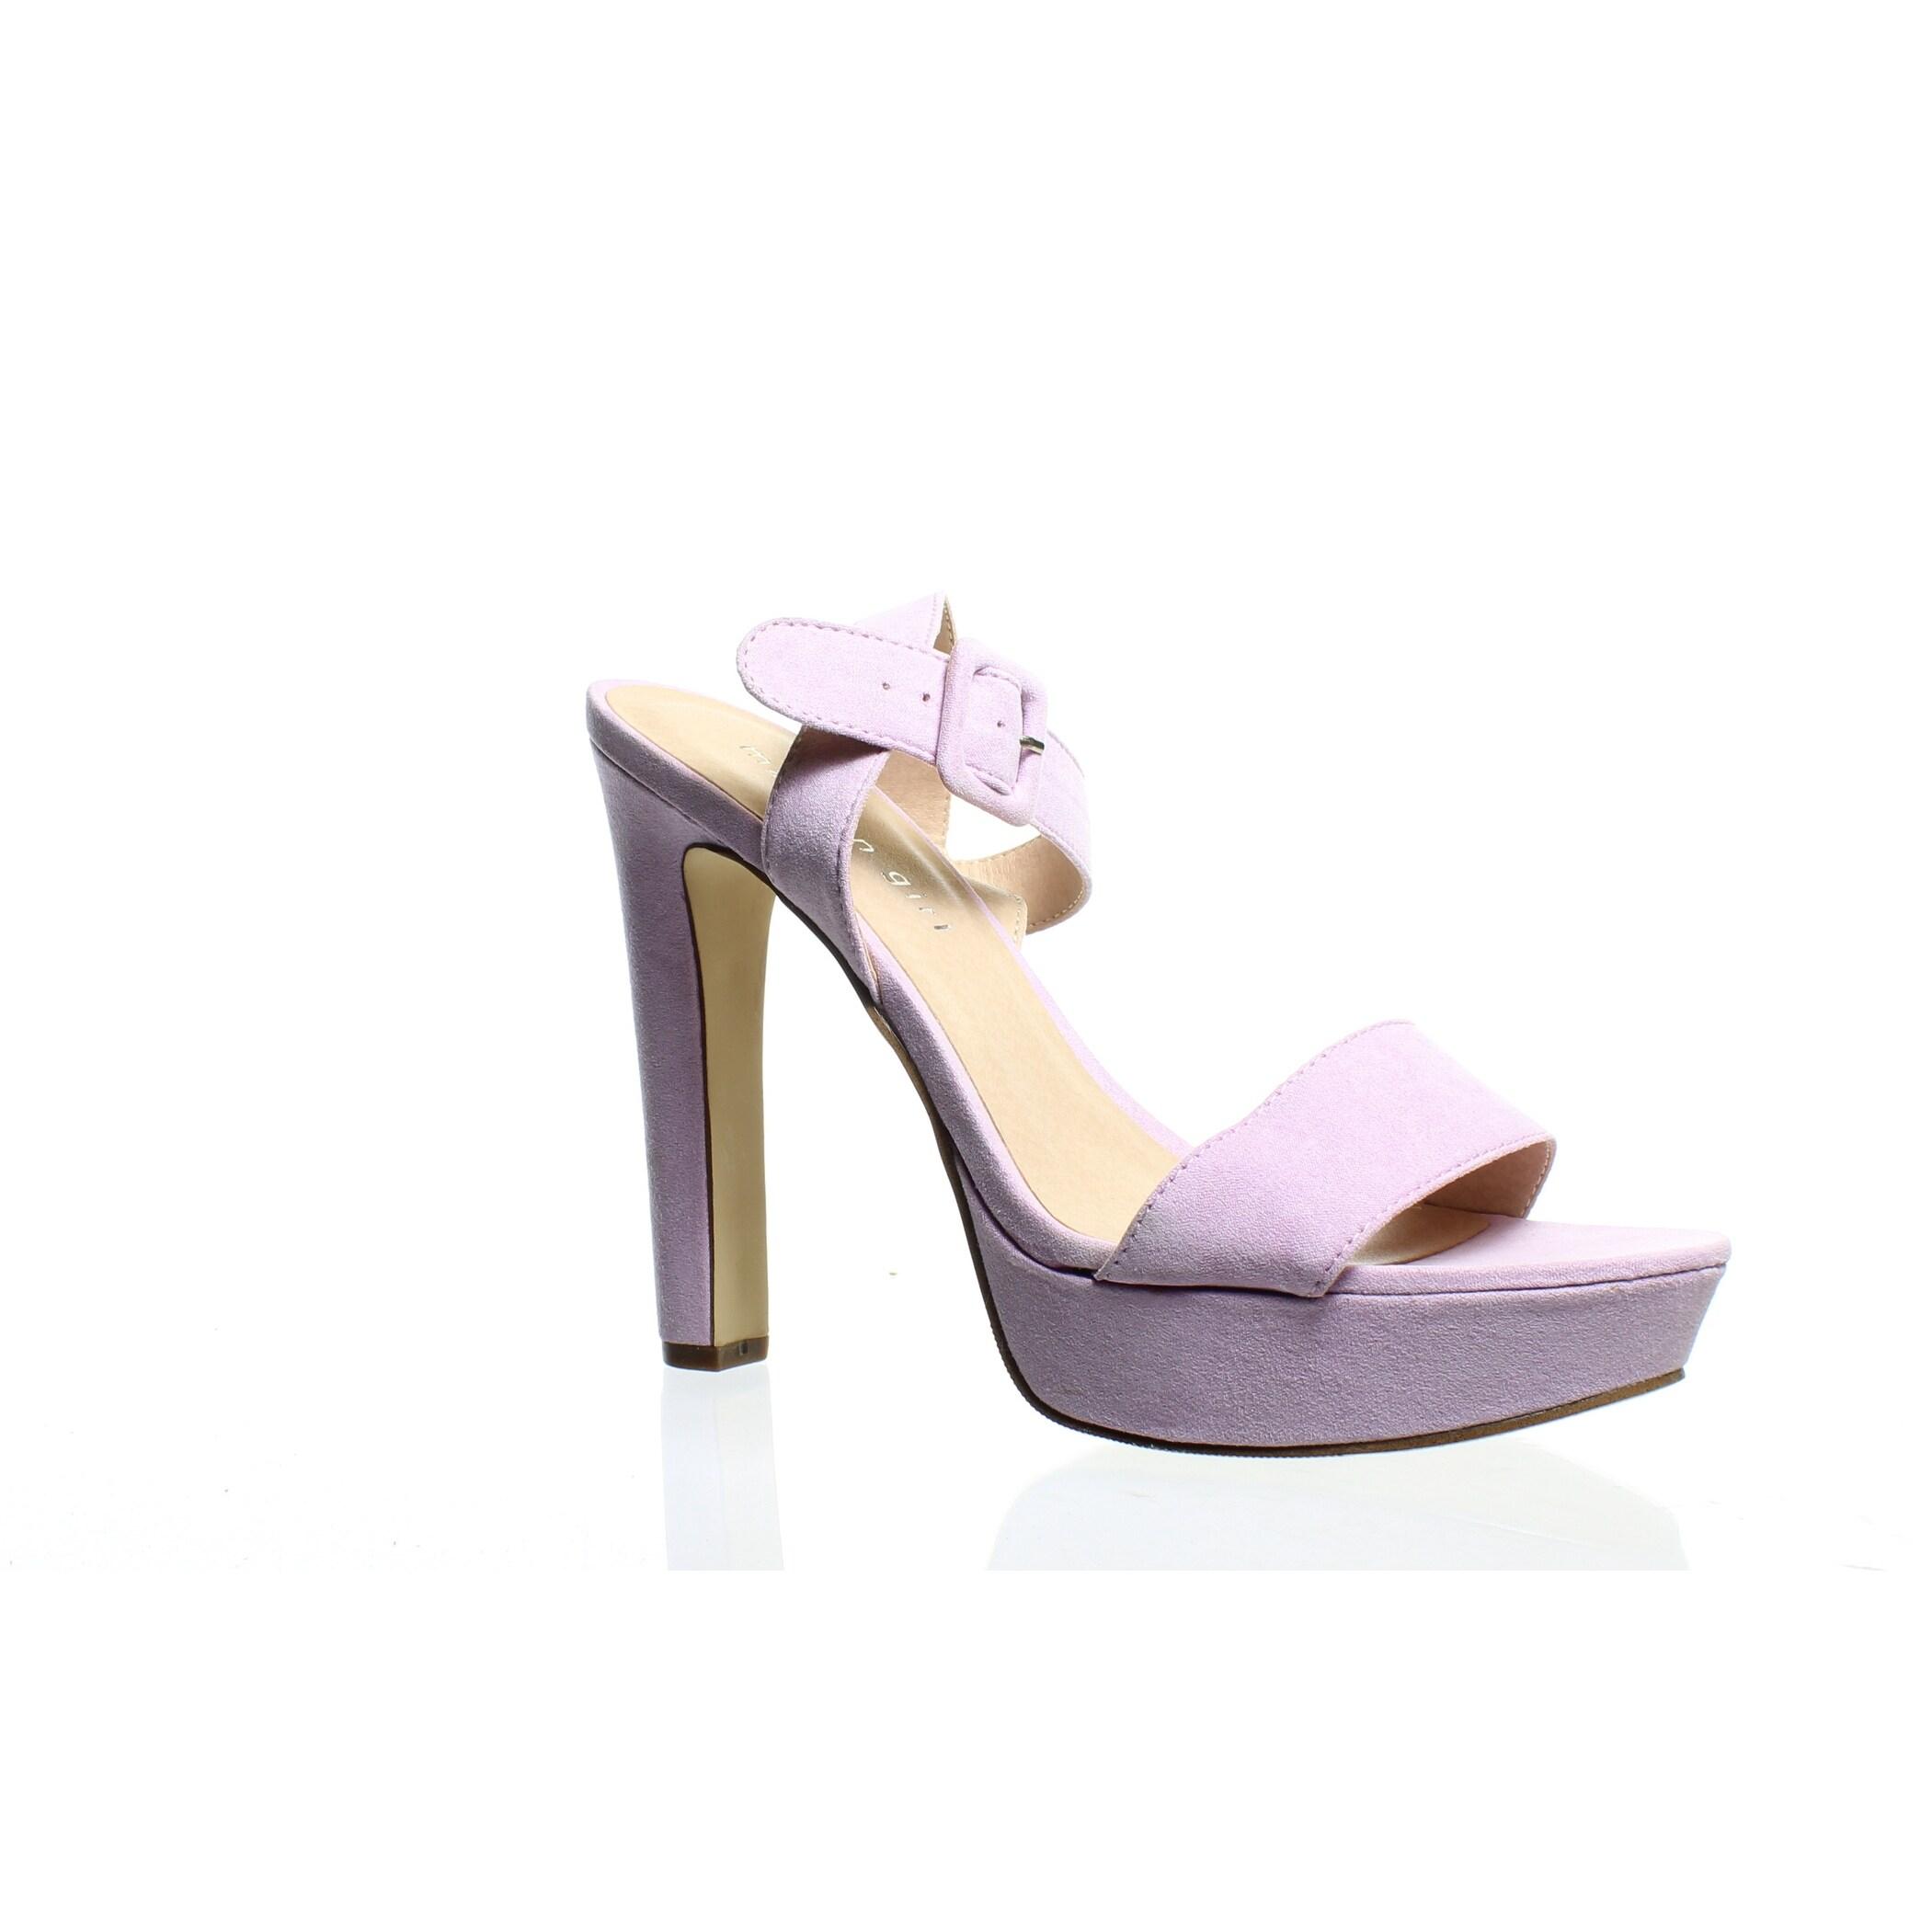 b6916bb97bb9 Buy Madden Girl Women s Heels Online at Overstock